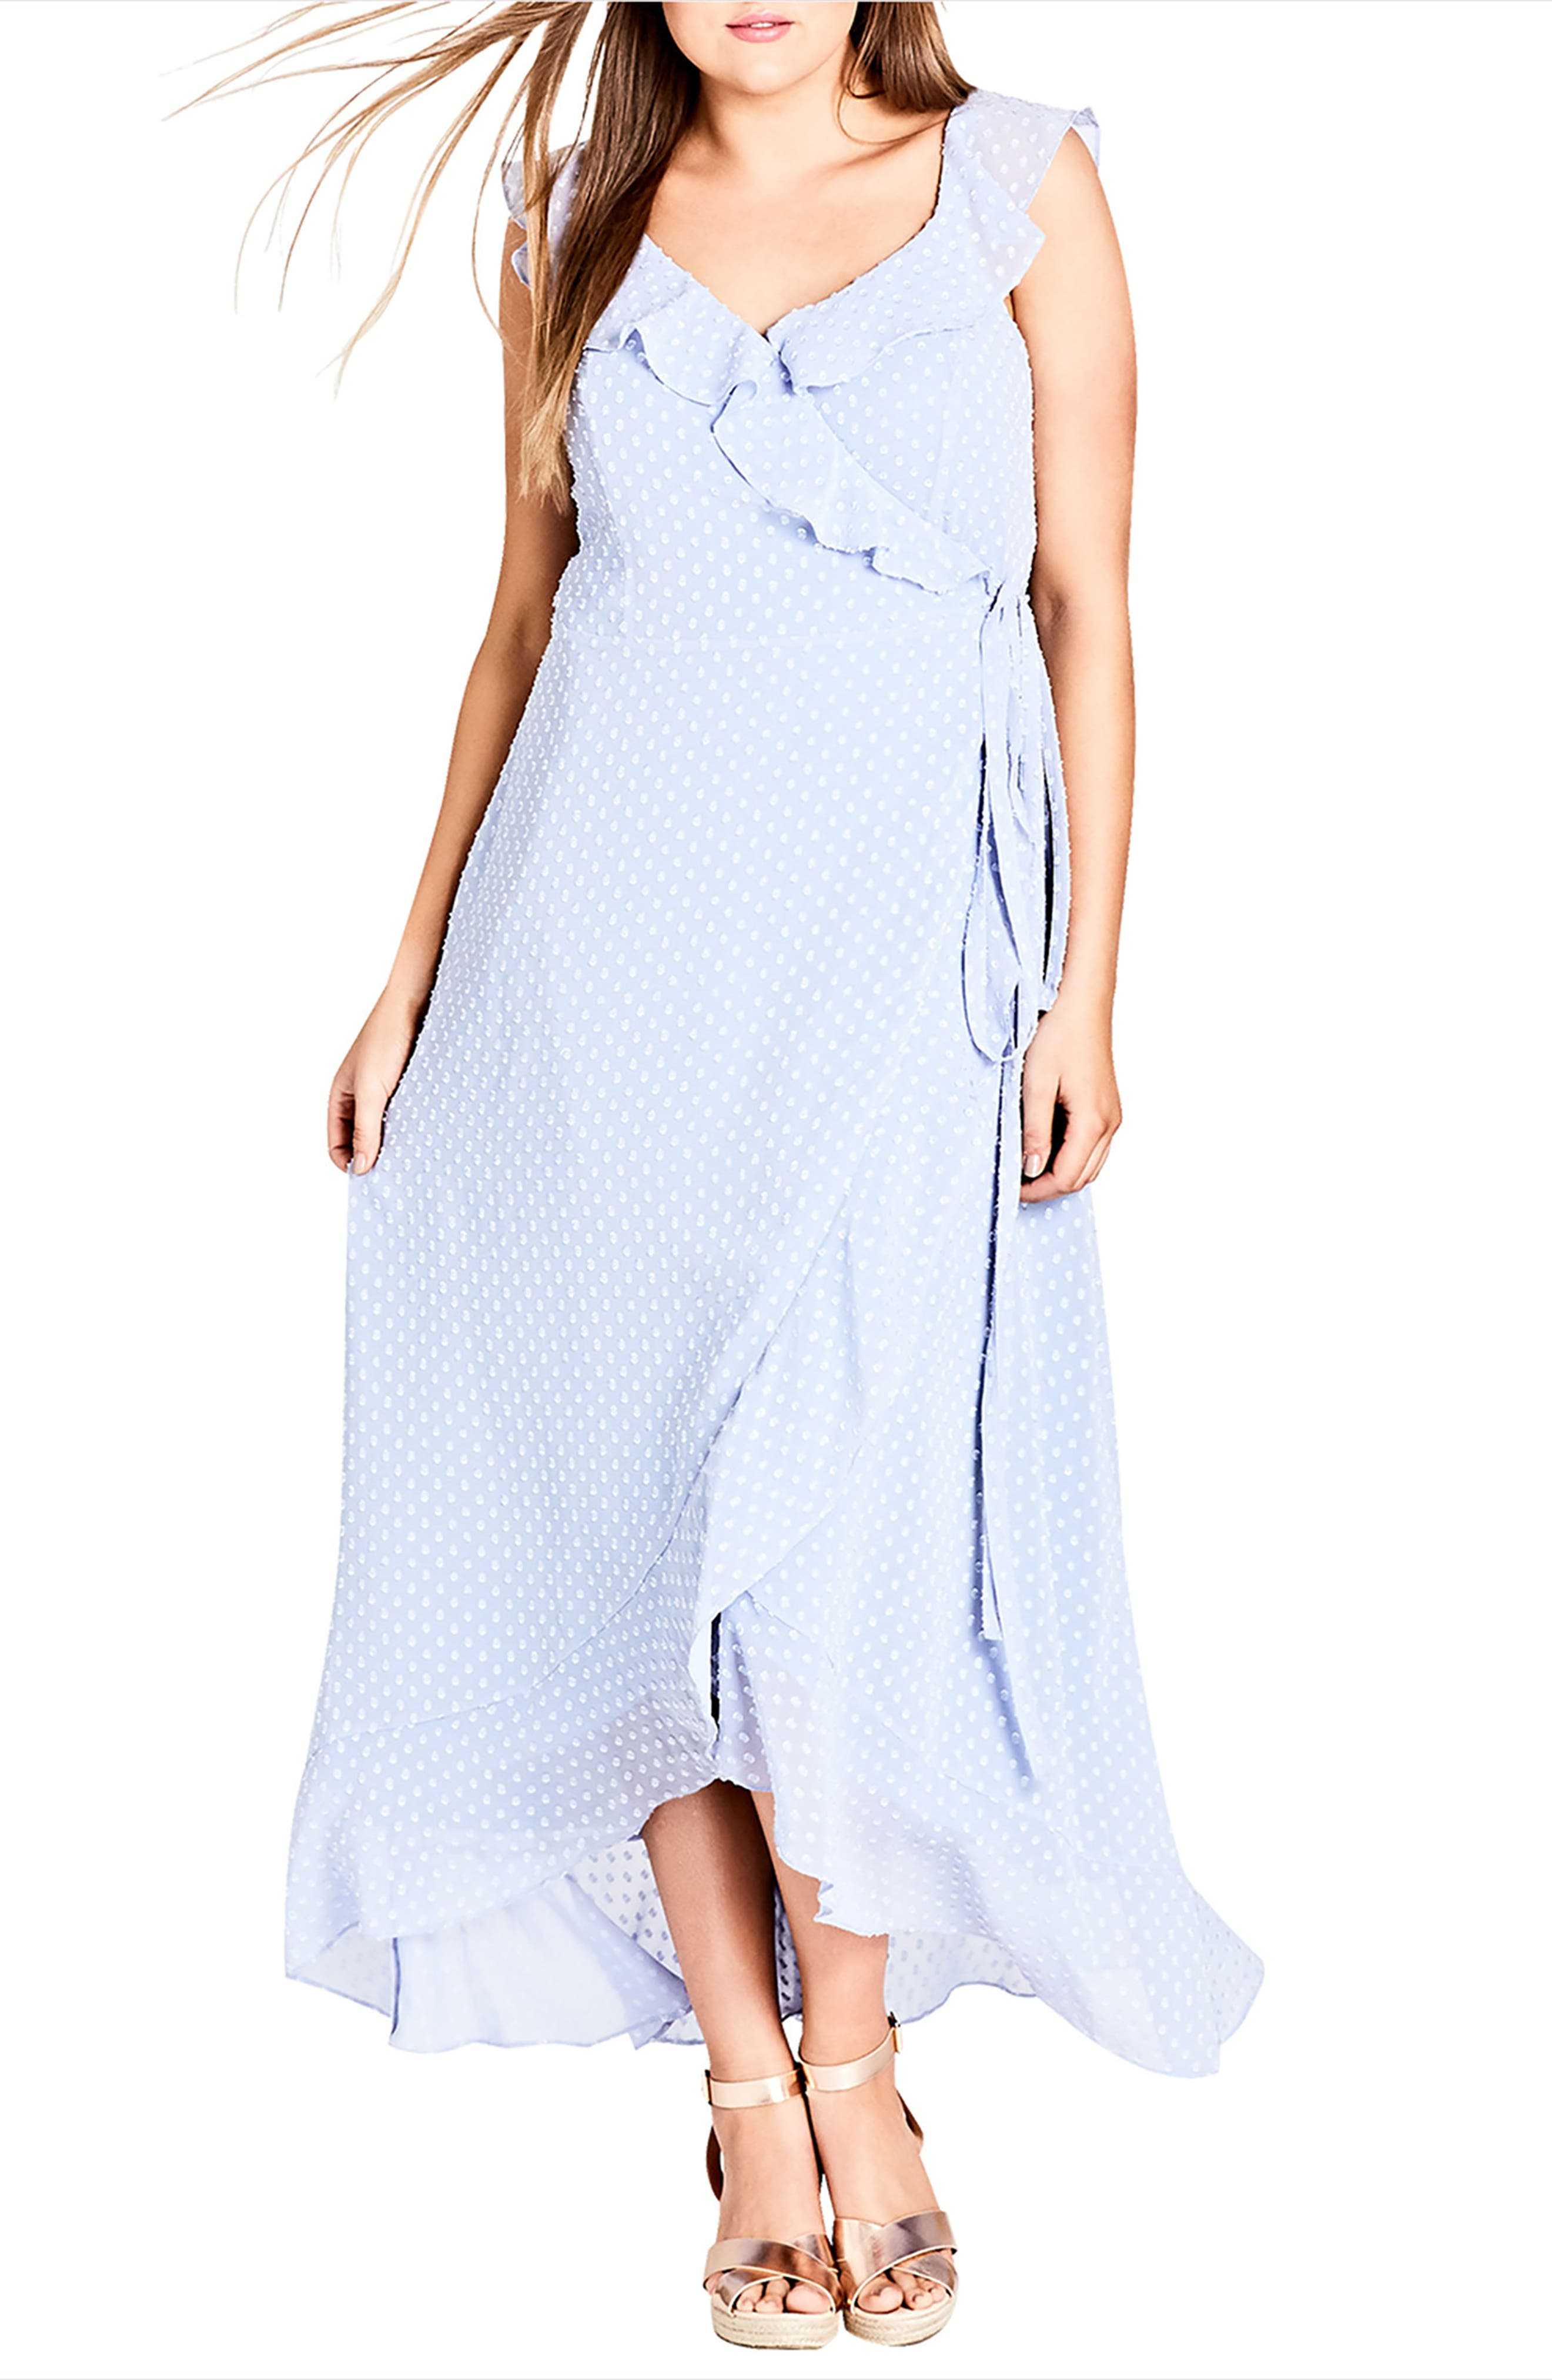 Dot Fil Coupé Ruffle Maxi Dress,                             Main thumbnail 1, color,                             514